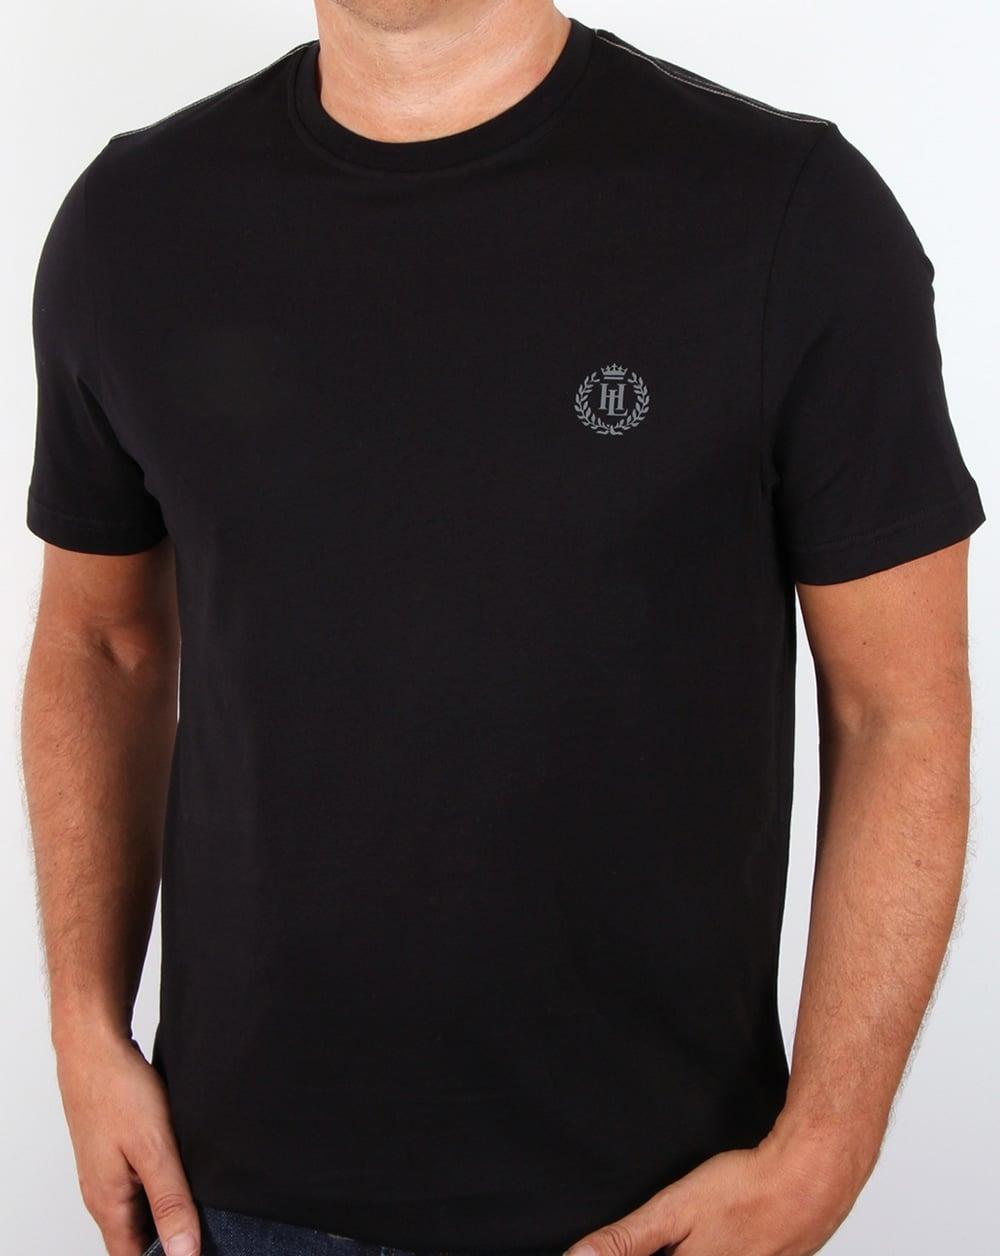 henri lloyd t shirt